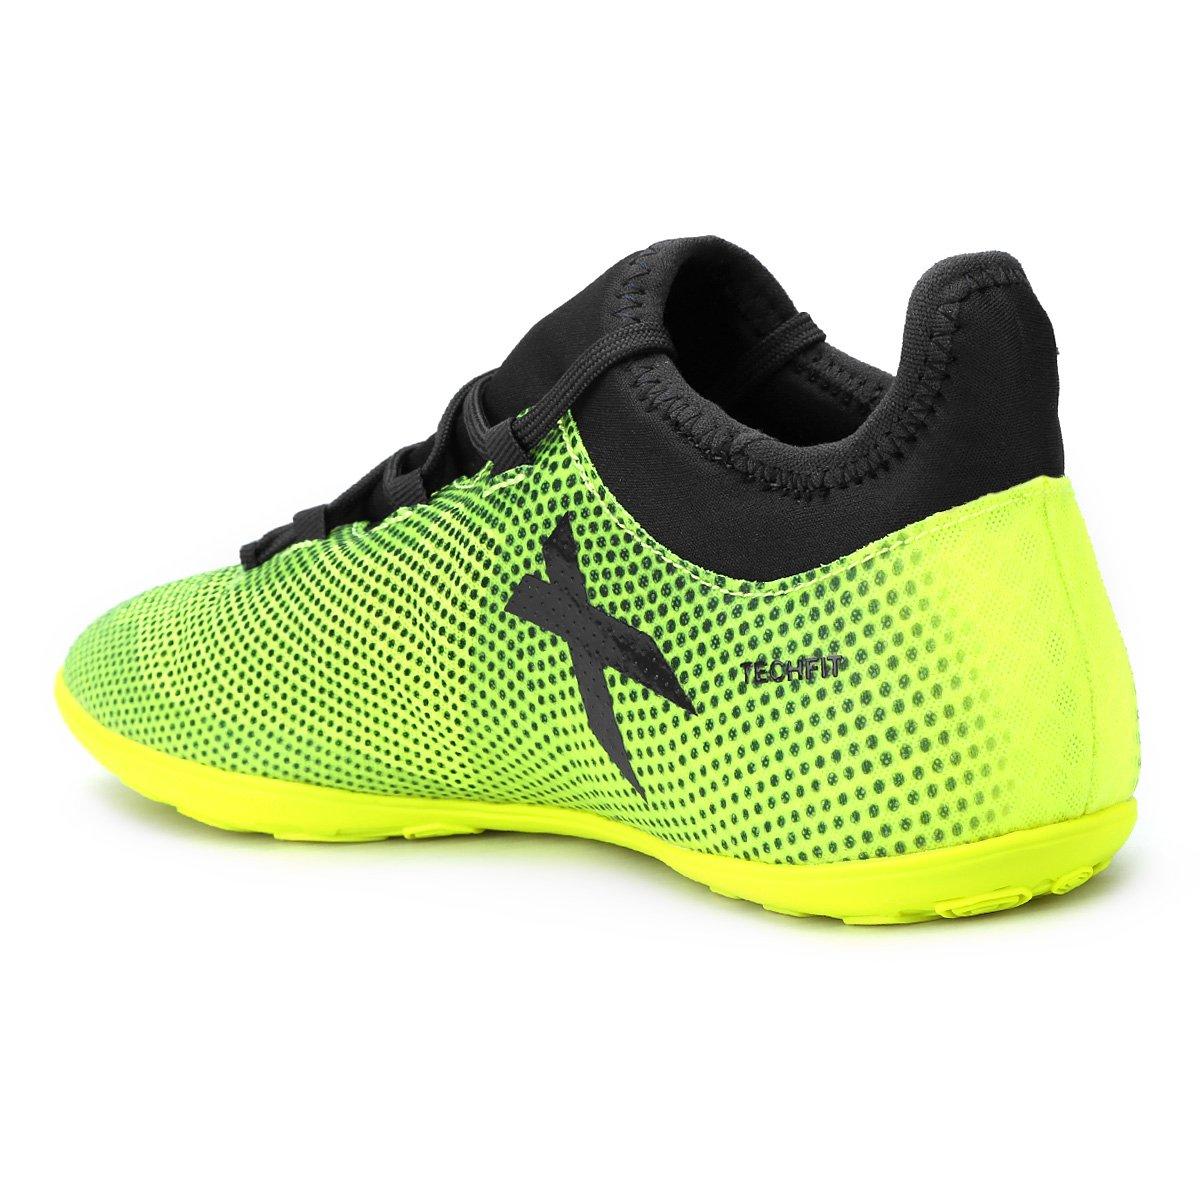 9f4b28dafd Chuteira Futsal Adidas X 17.3 IN - Verde claro - Compre Agora